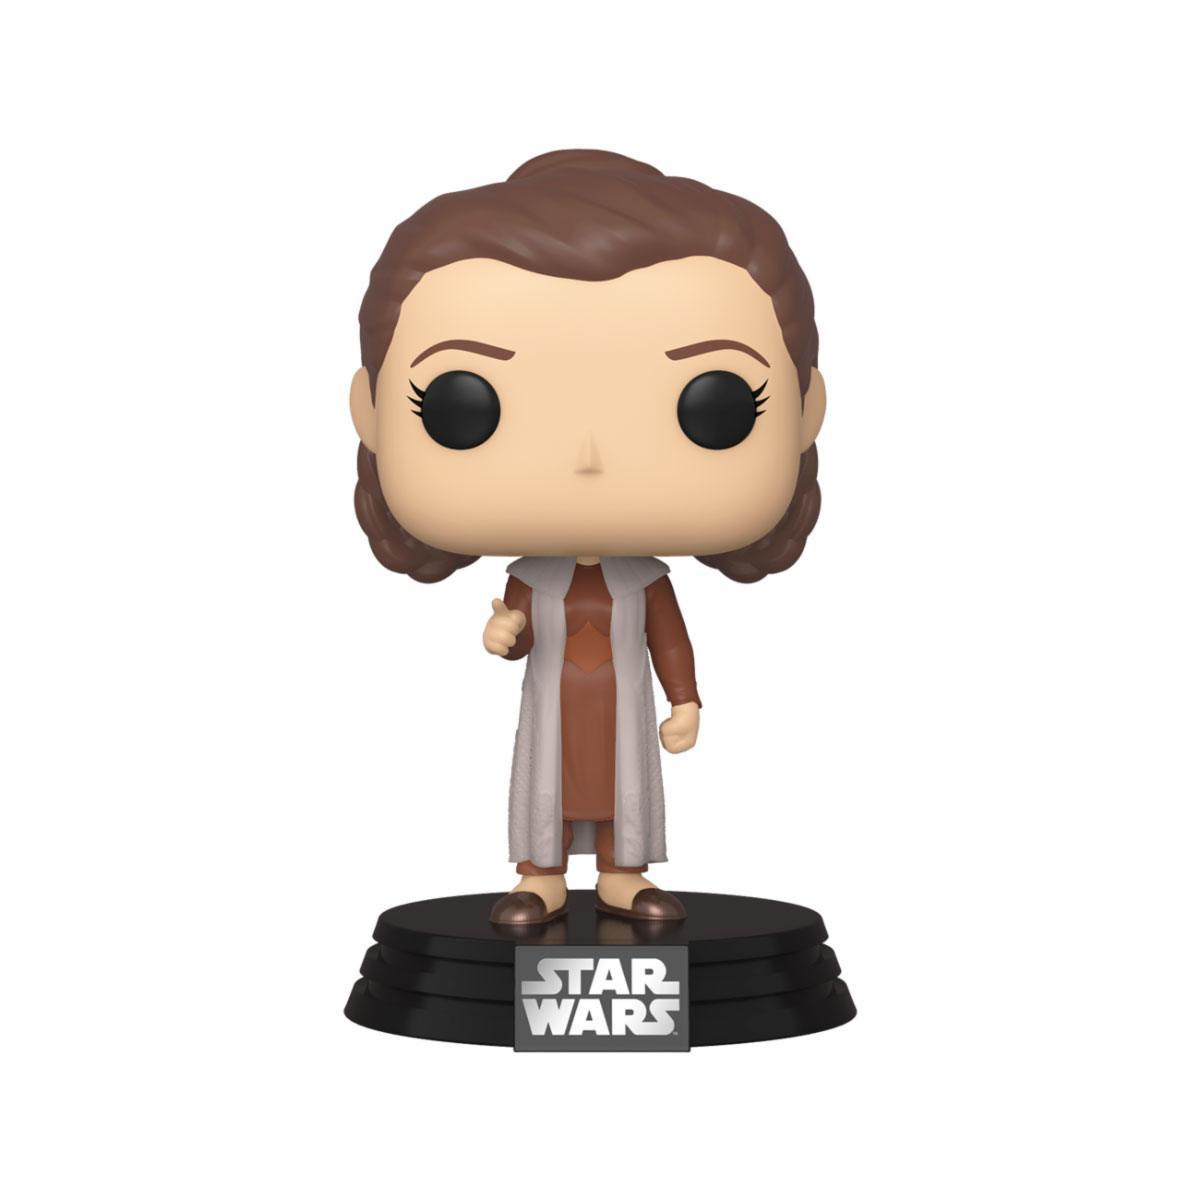 Star Wars POP! Movies Vinyl Figure Leia (Bespin) 9 cm